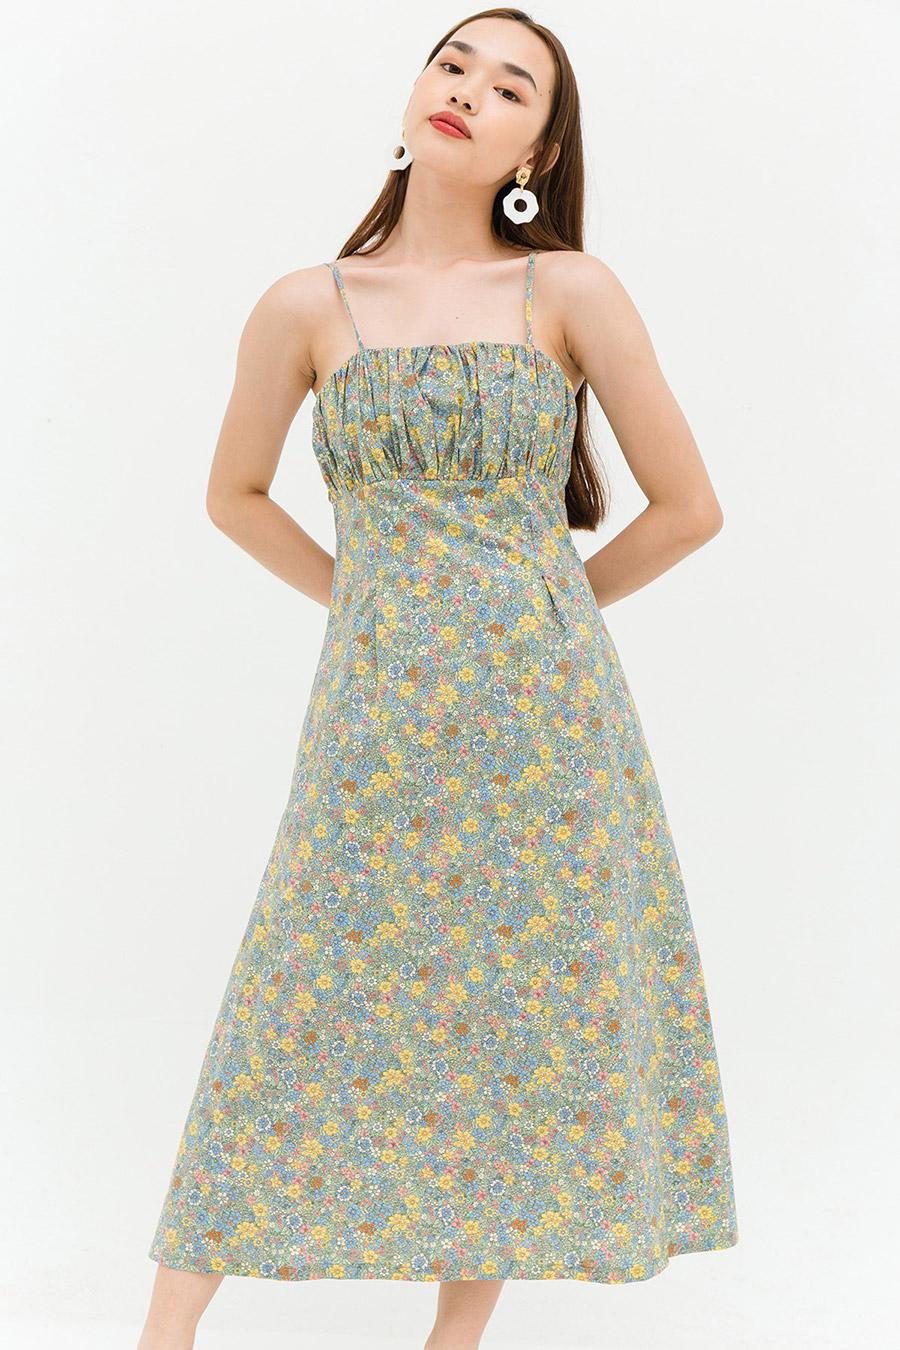 BENNIE DRESS - HARUKI [BY MODPARADE]